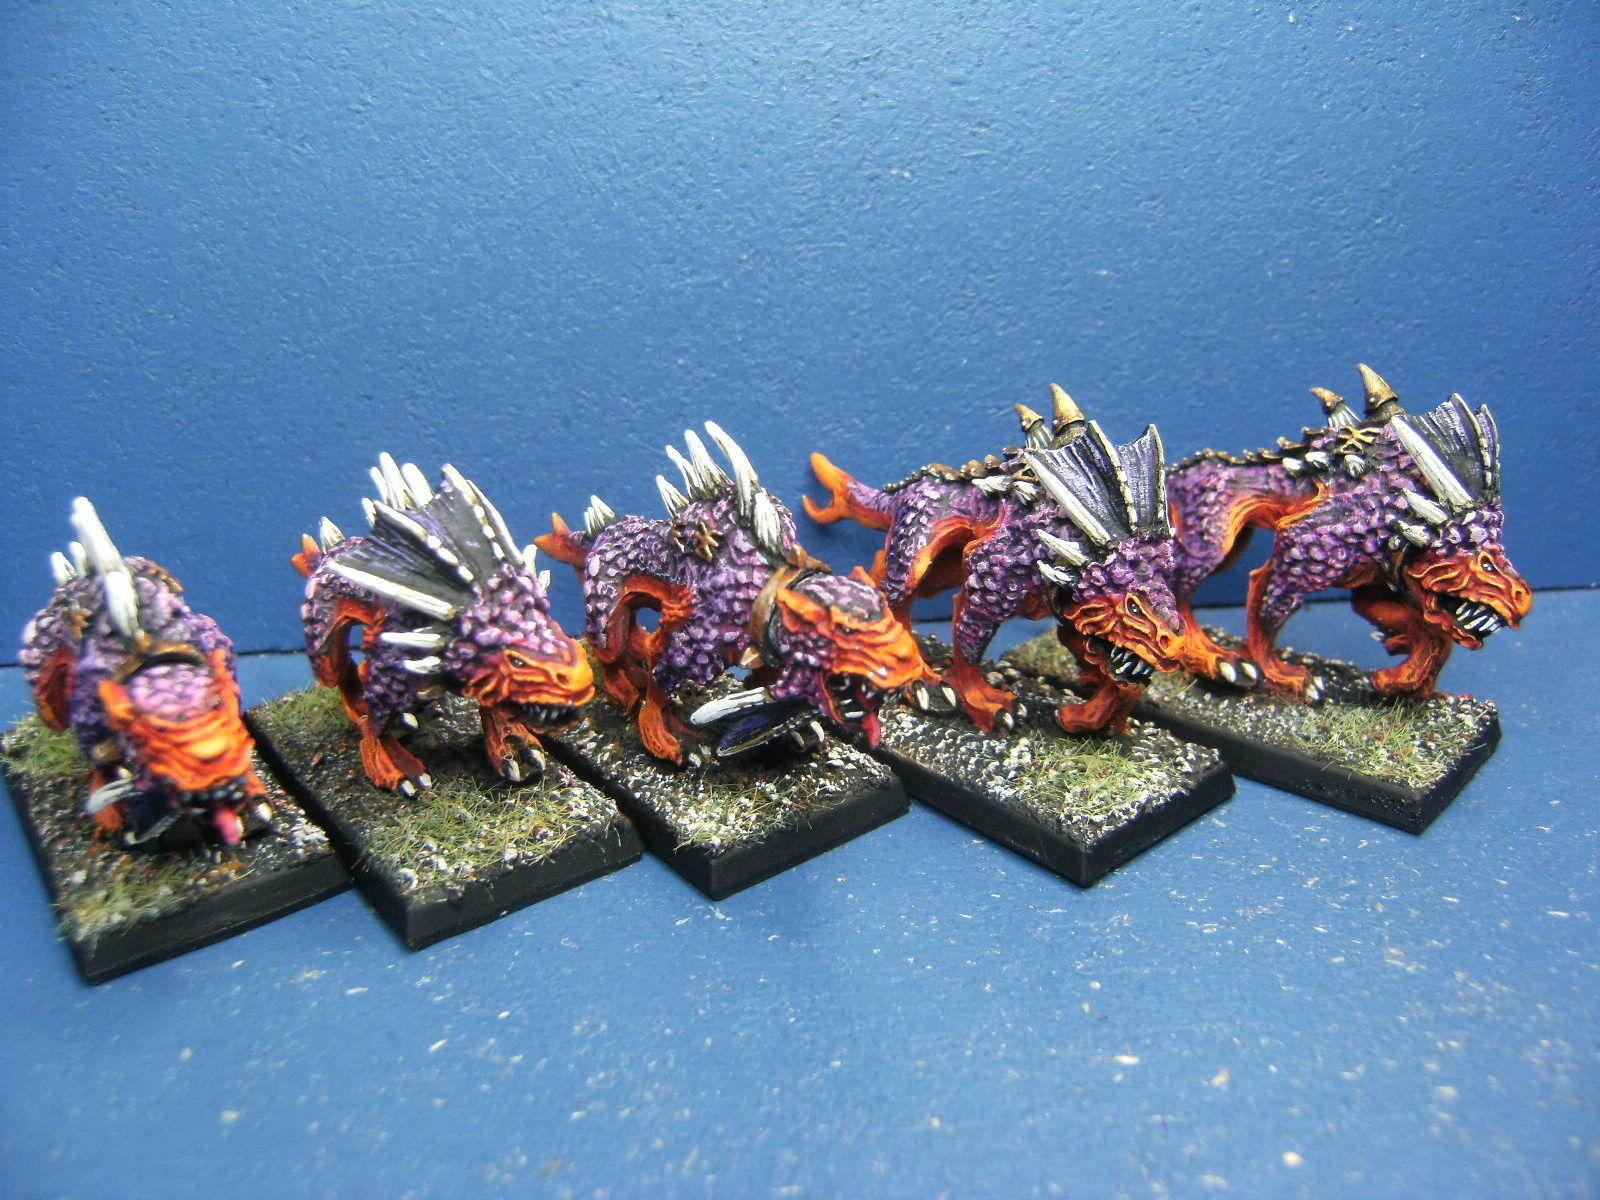 5 Khorne sangue cani dei Demoni del Caos in Metallo dipinta Top 3